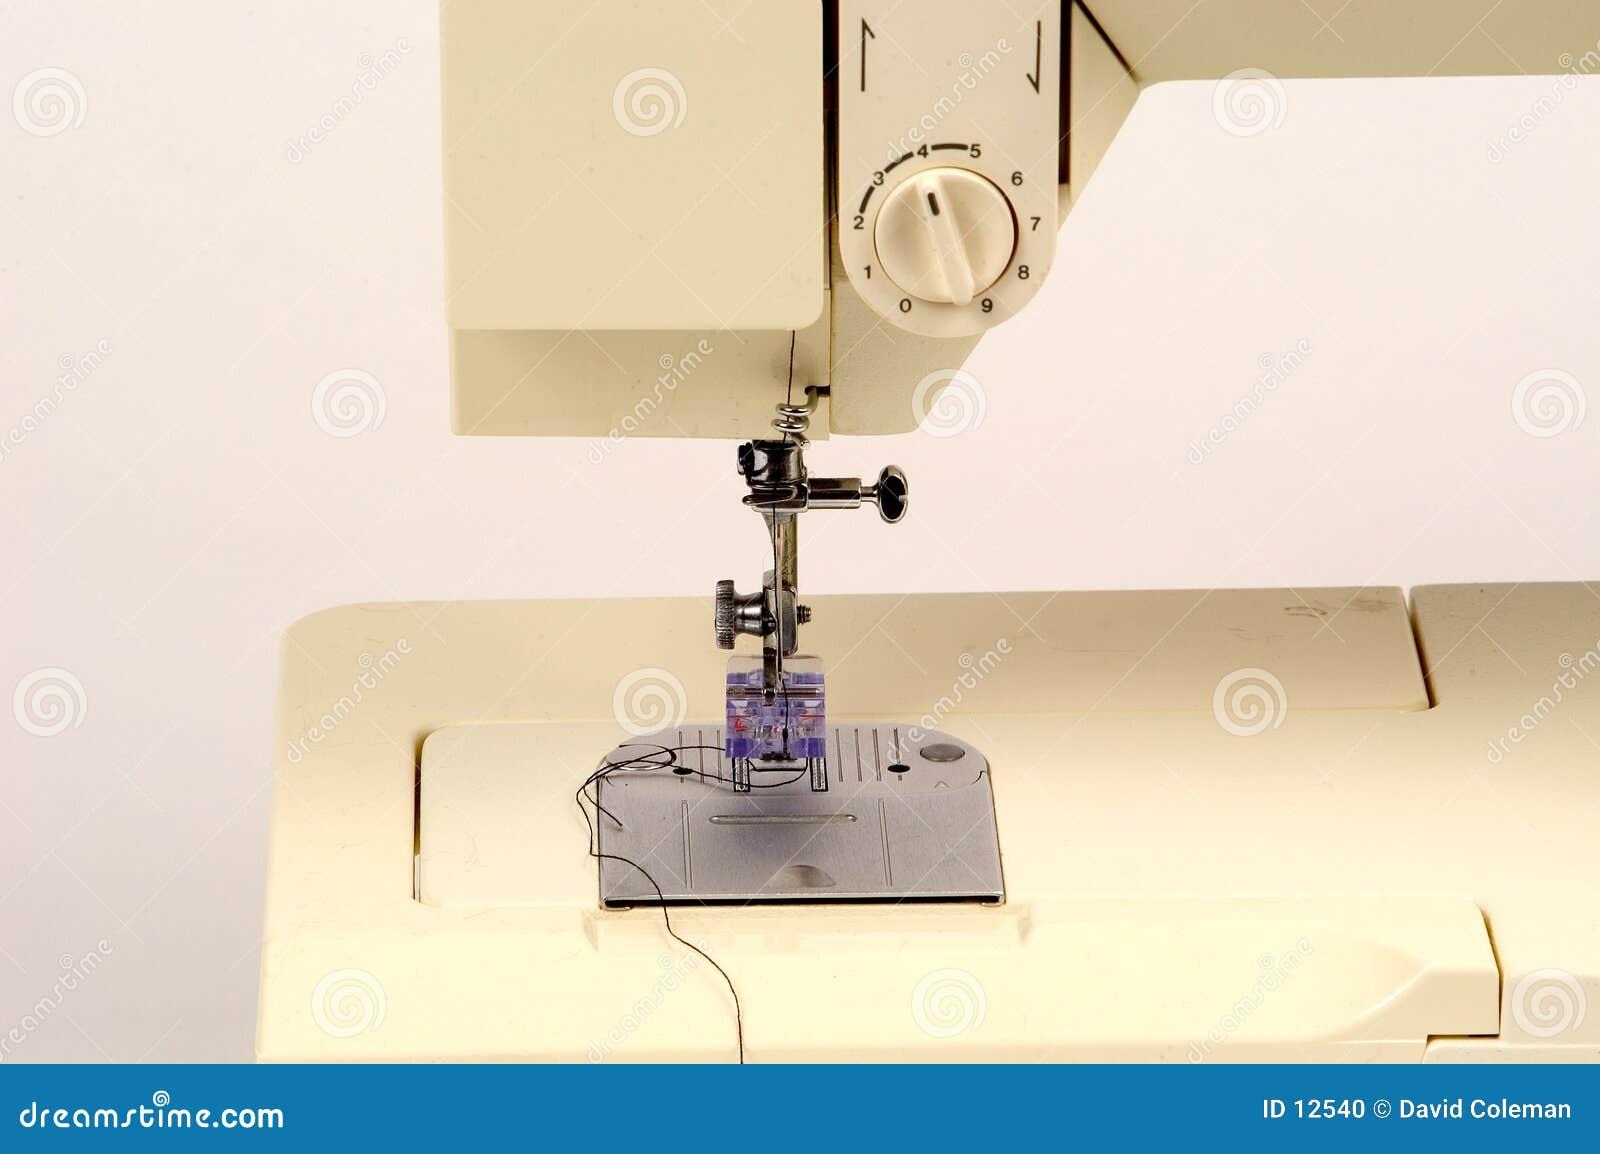 Detalle de la máquina de coser